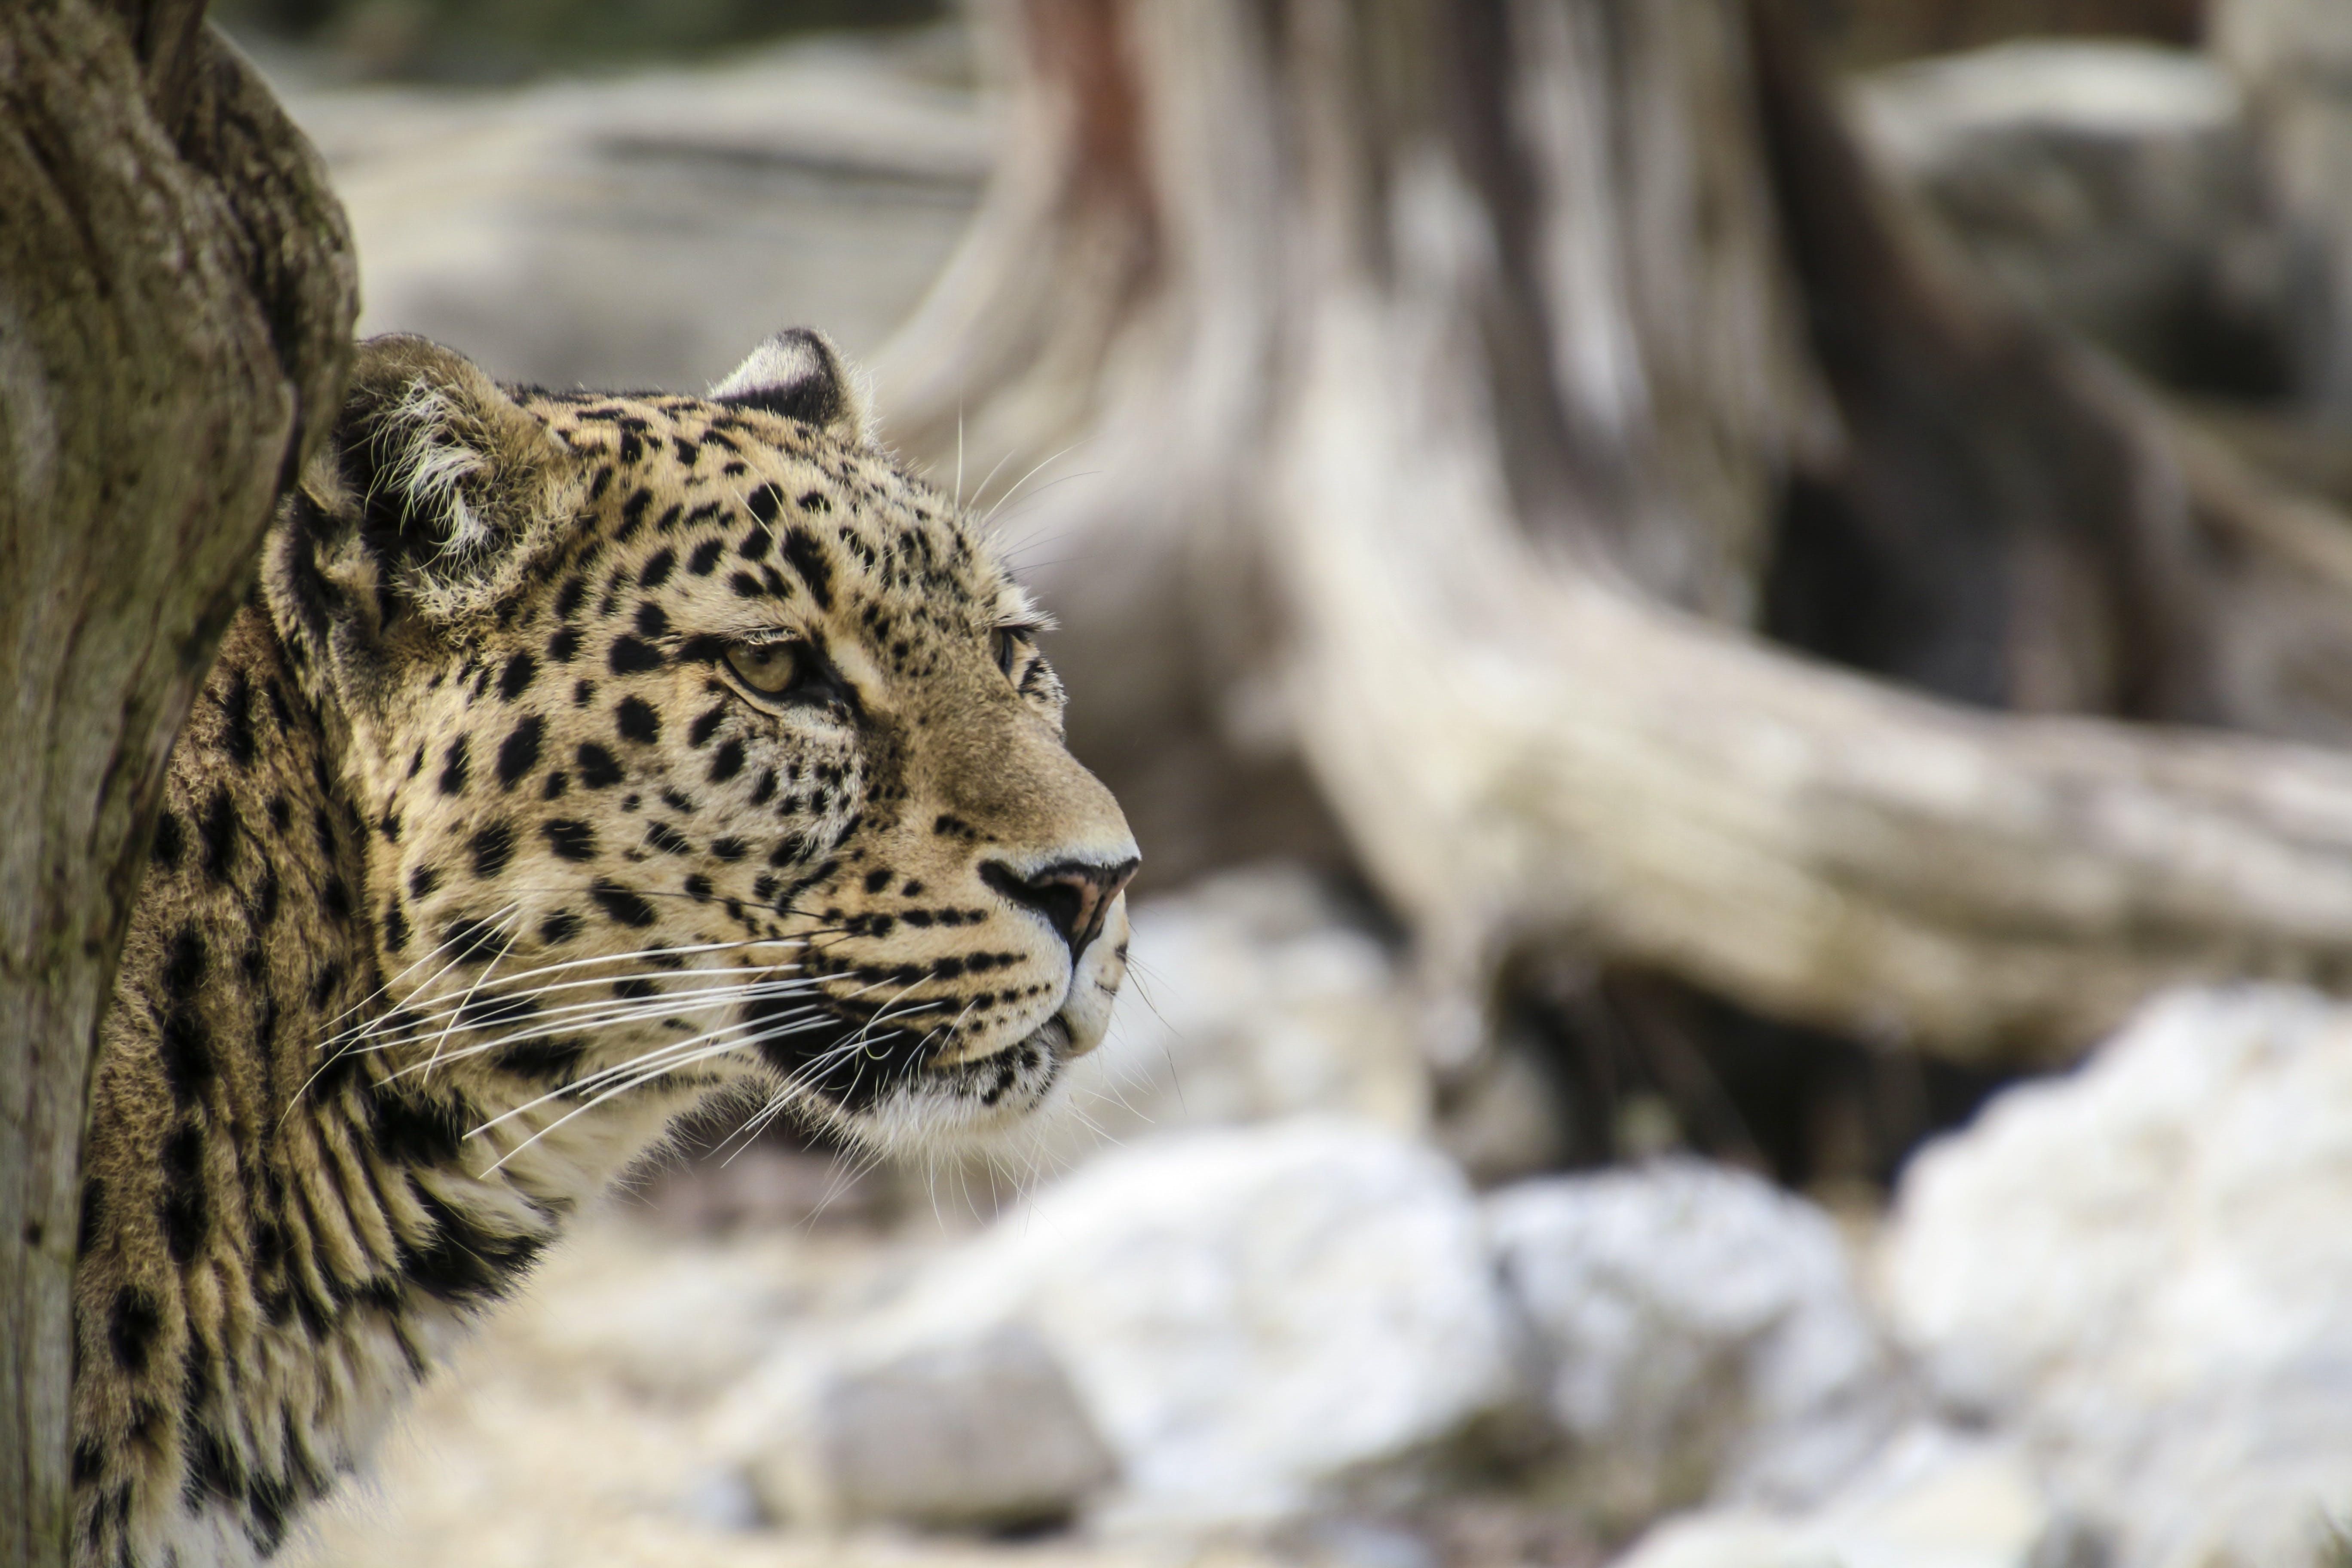 Безкоштовне стокове фото на тему «близький, великий план, дика природа, дика тварина»